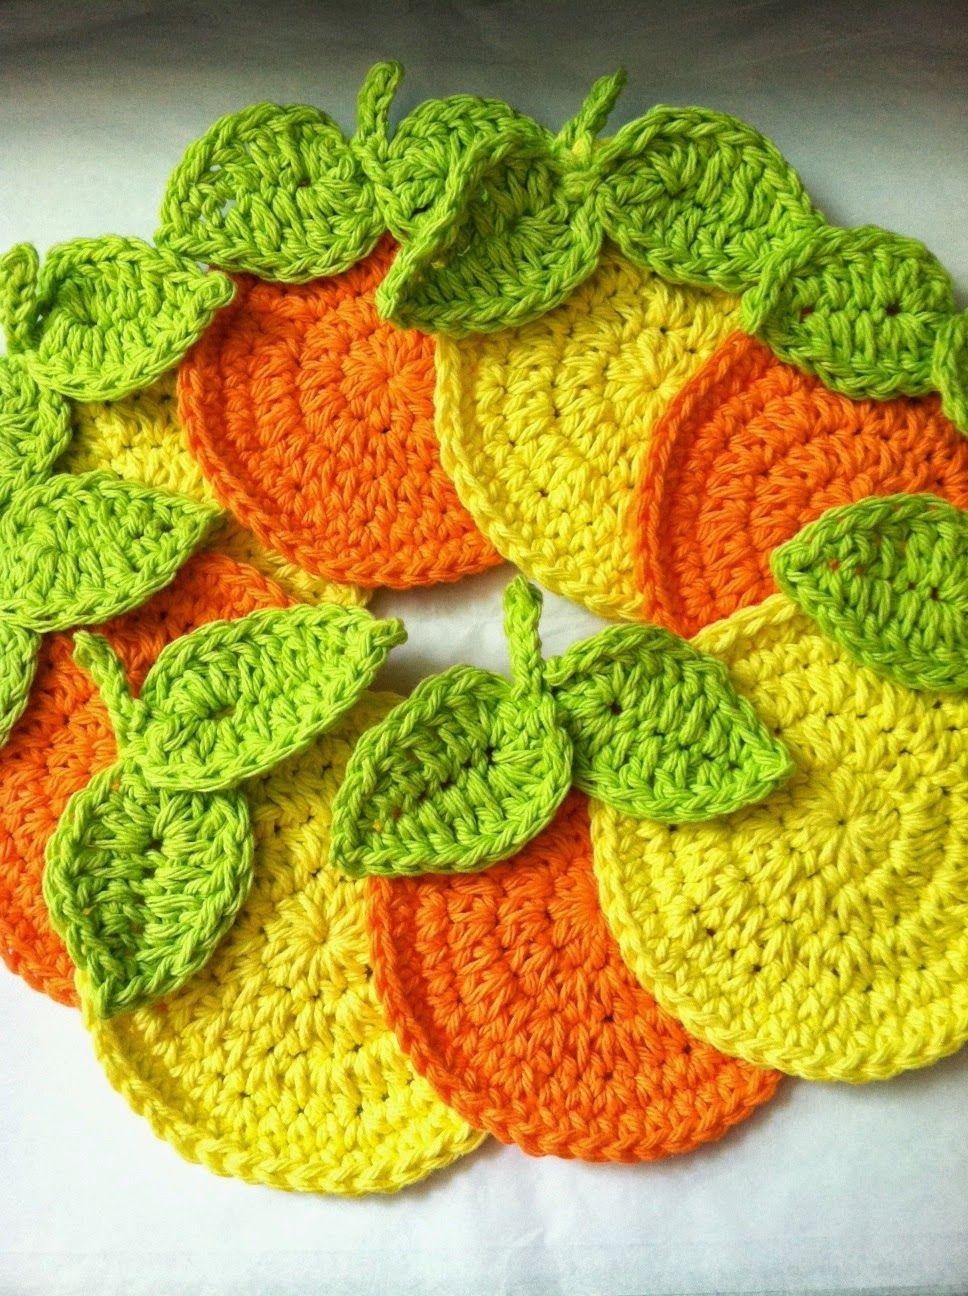 ♪ Crochê em Laranjas - / ♪ Crochet in Oranges - | Rita Zavarize ...